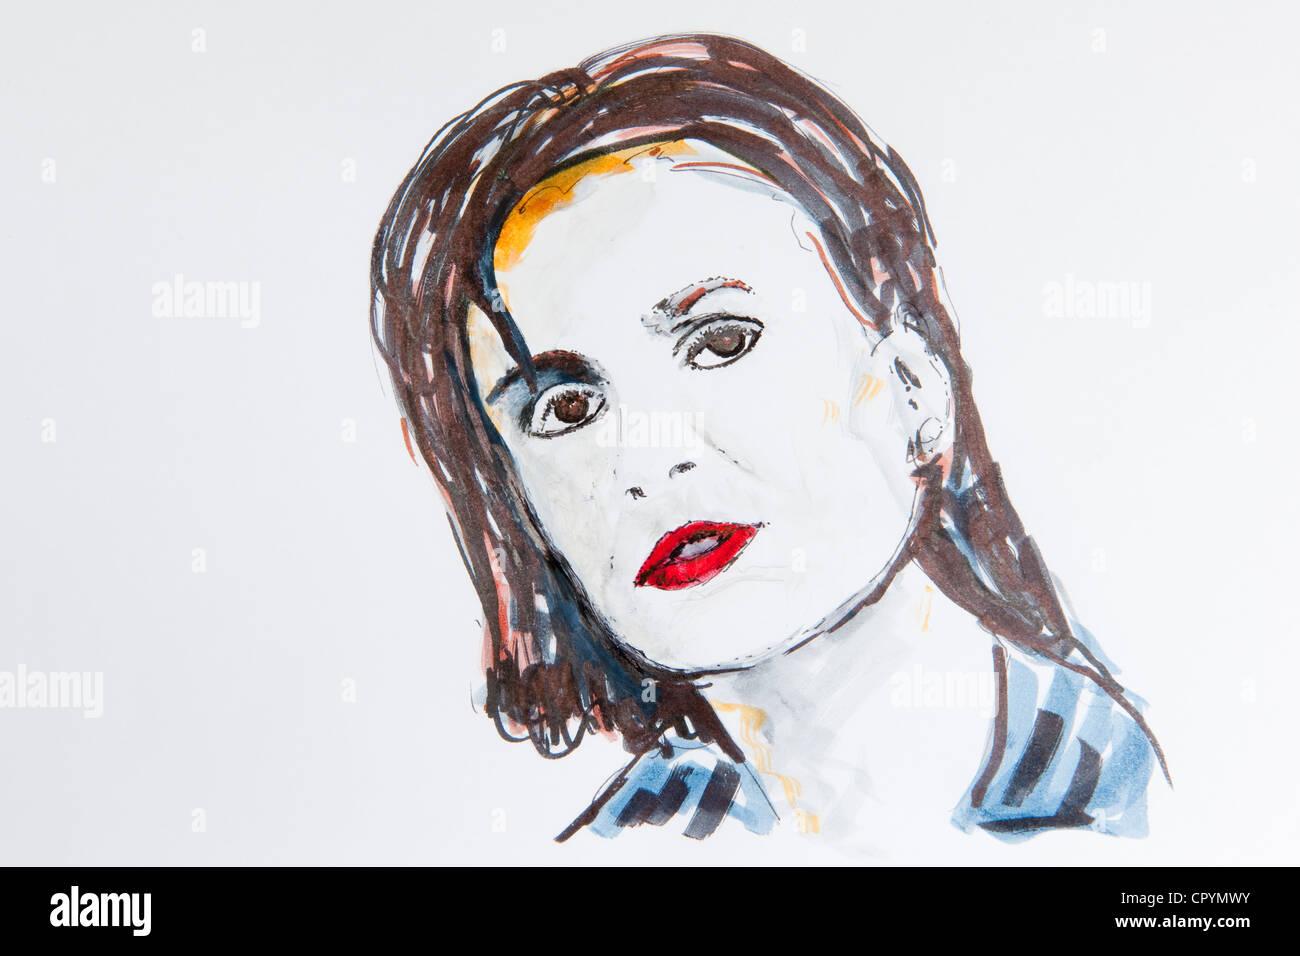 Sandra Maischberger, German TV presenter, journalist, drawing by Gerhard Kraus, Kriftel, Germany Stock Photo